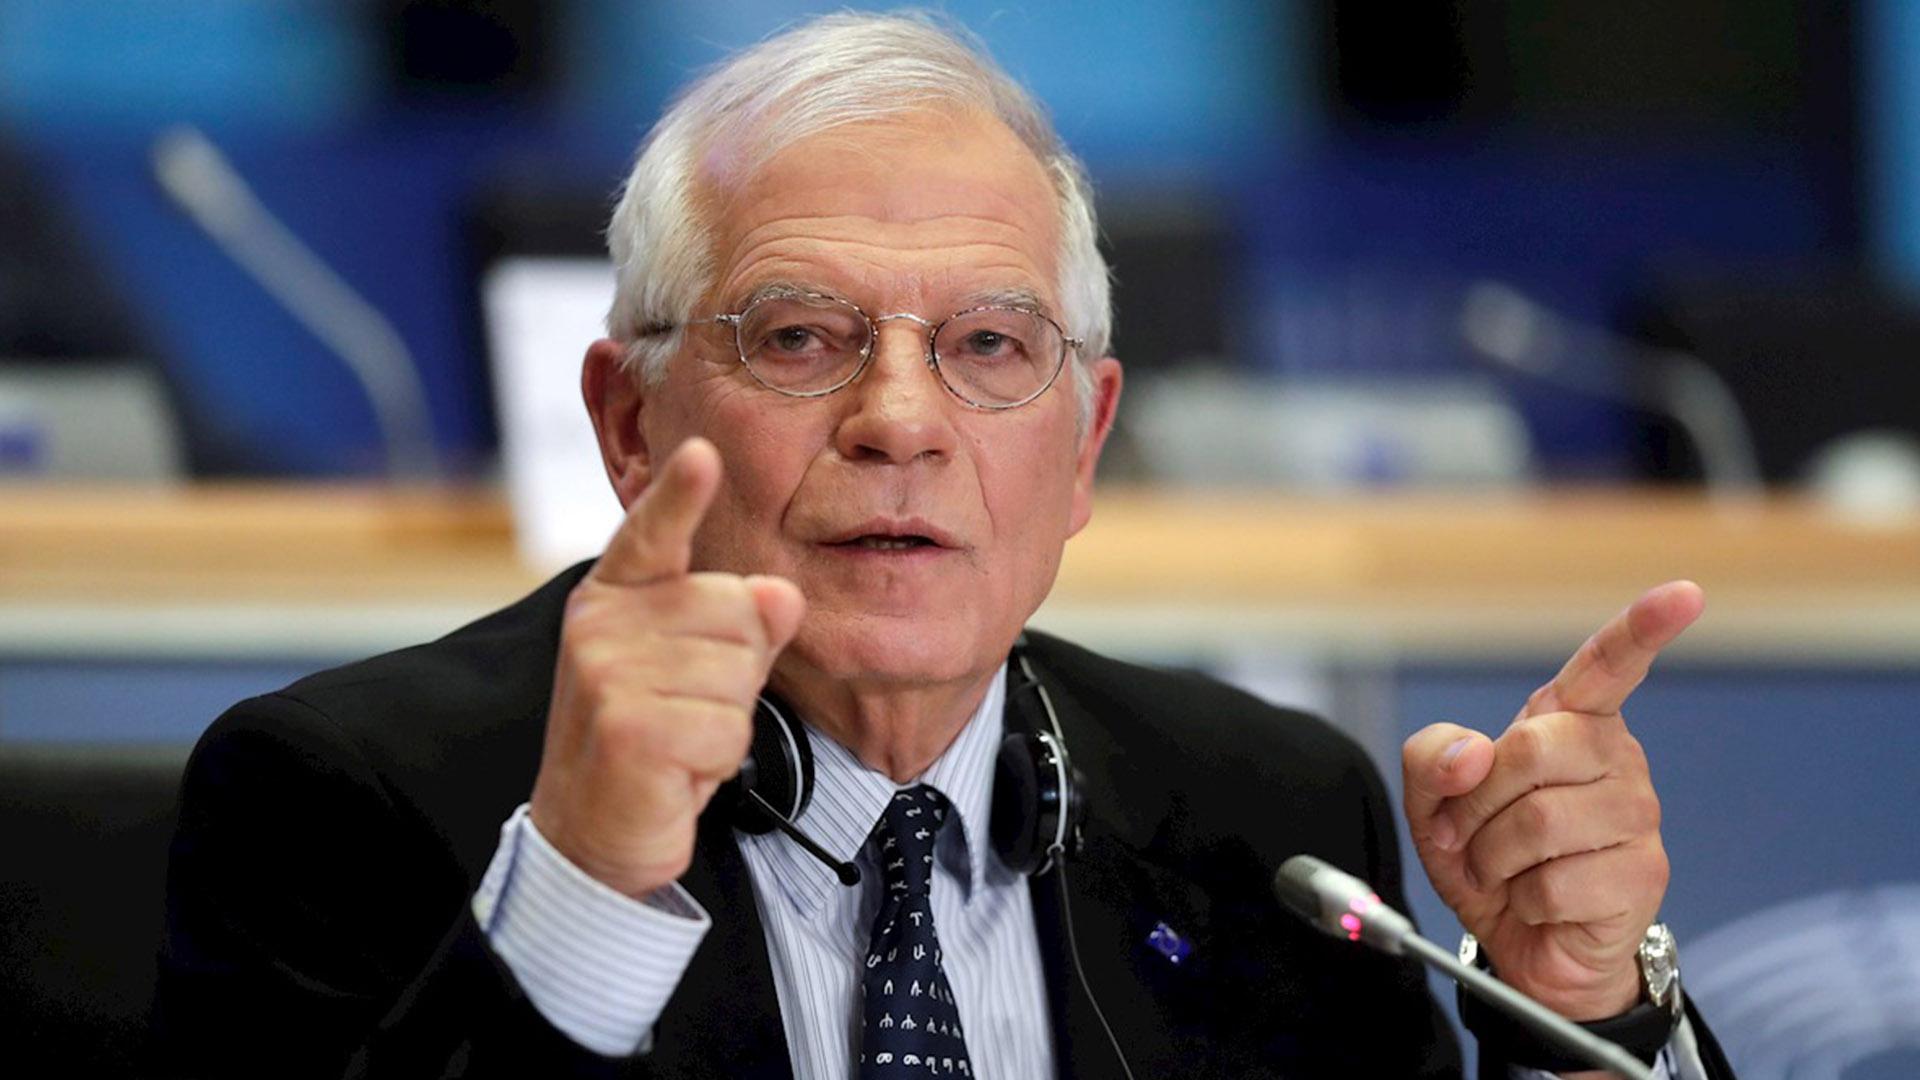 UE insta a Borrell a seguir facilitando el diálogo en Venezuela